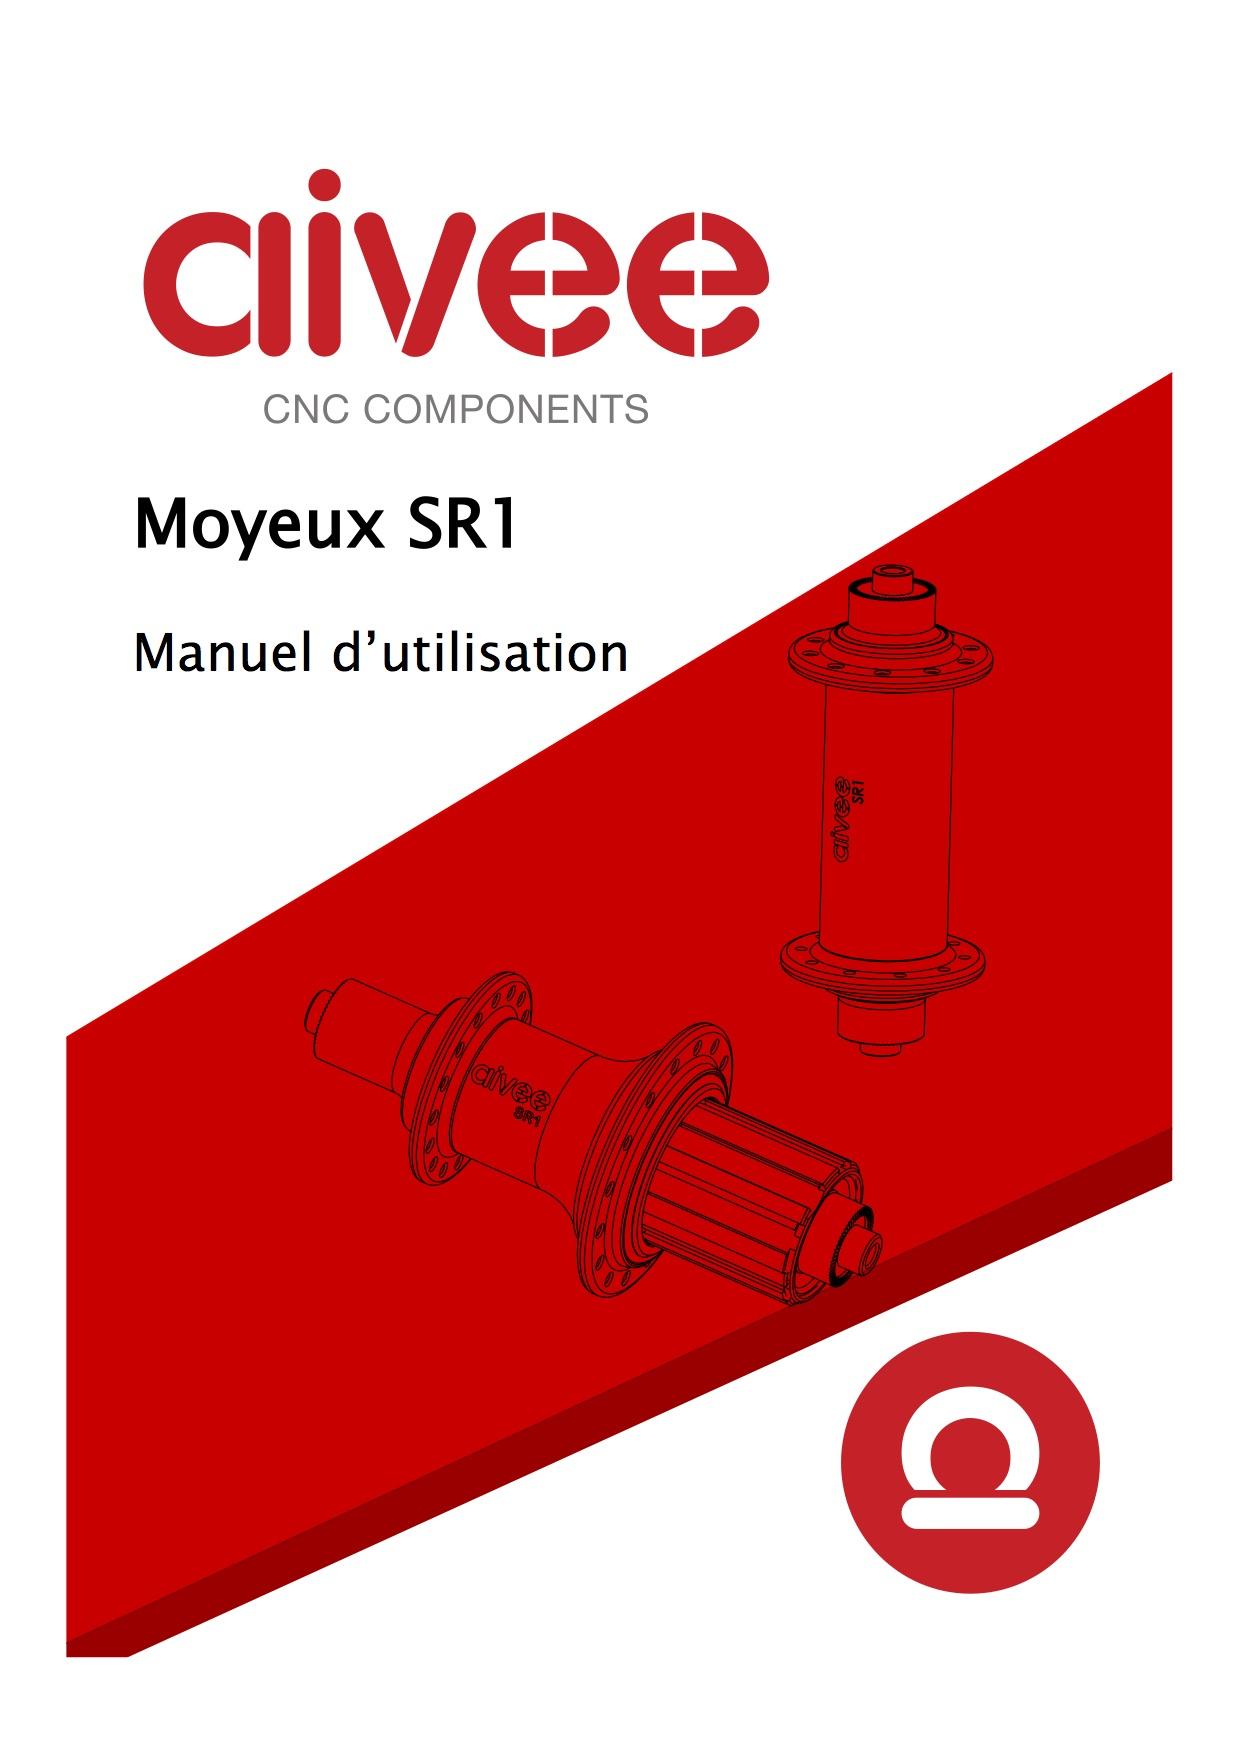 Aivee_SR1_Manuel_dutilisation .jpg